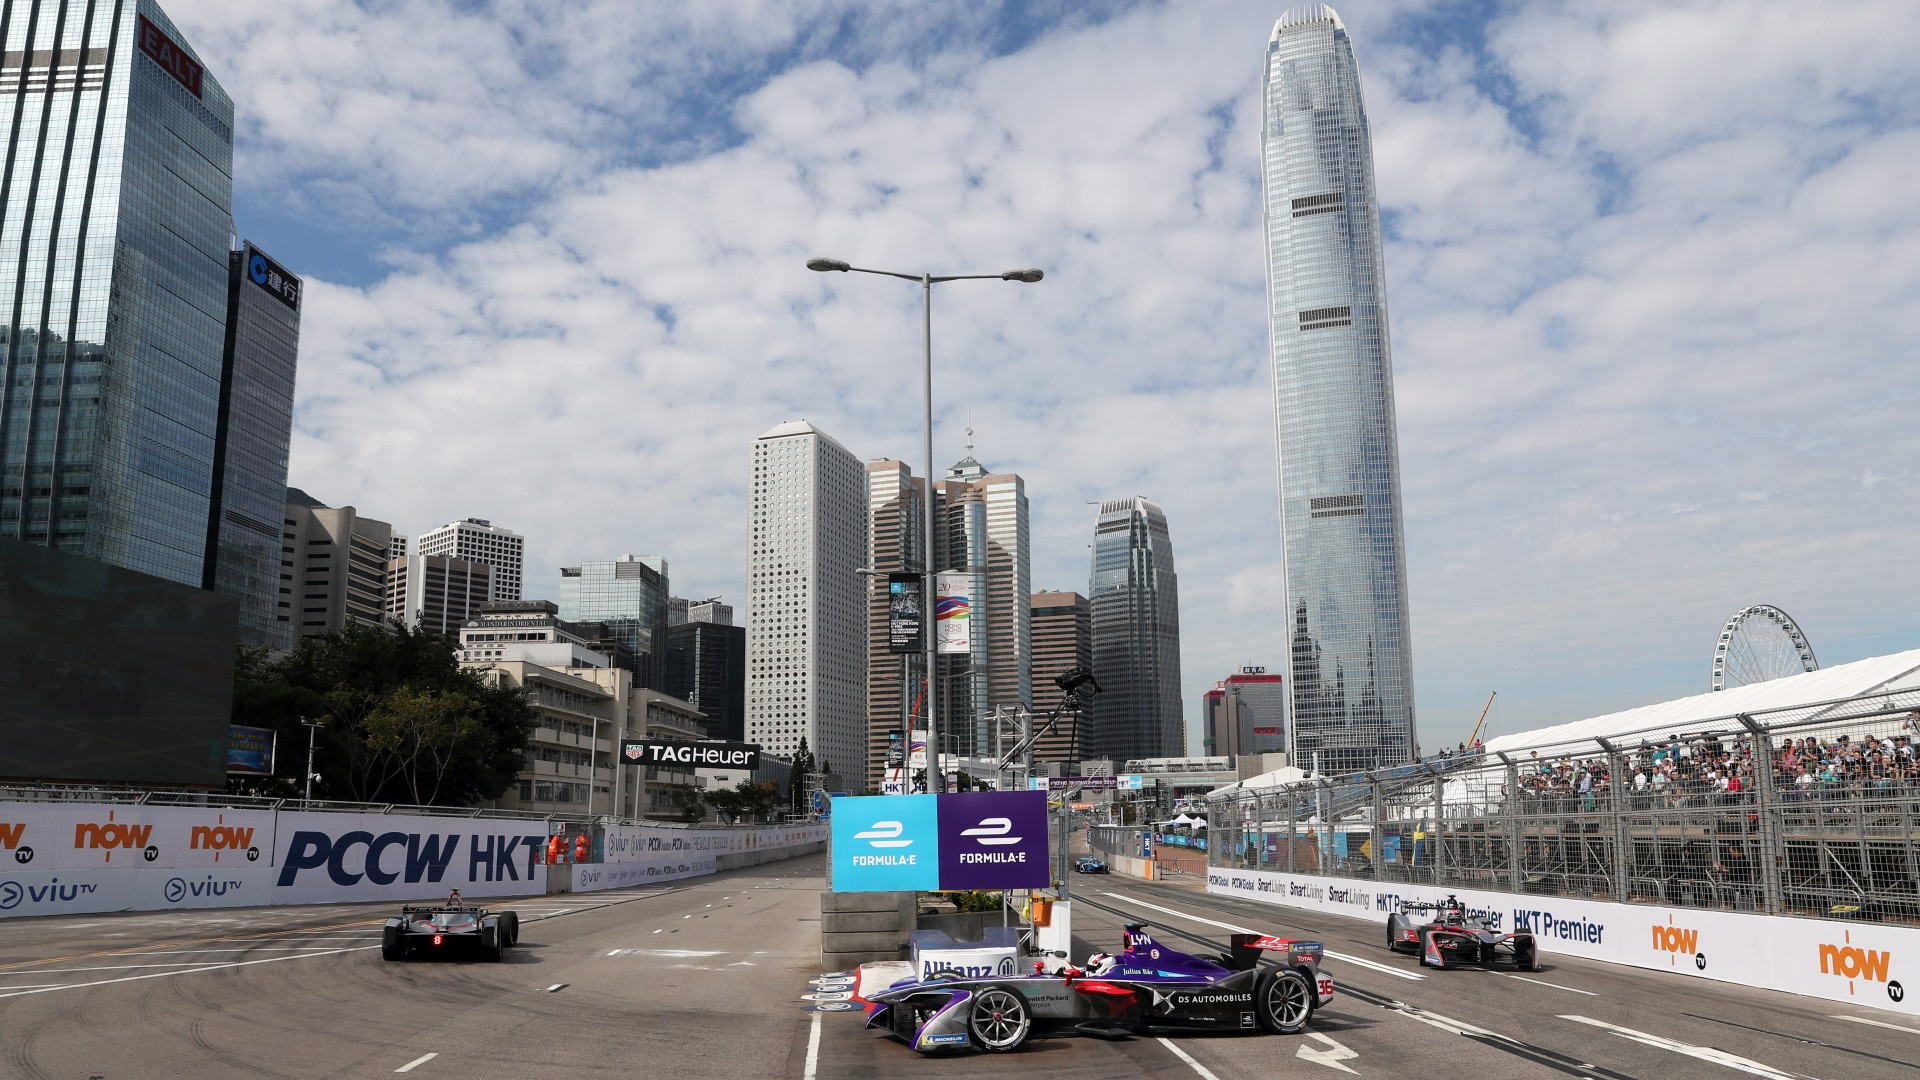 Formula E: Hong Kong could be dropped from 2020 calendar if